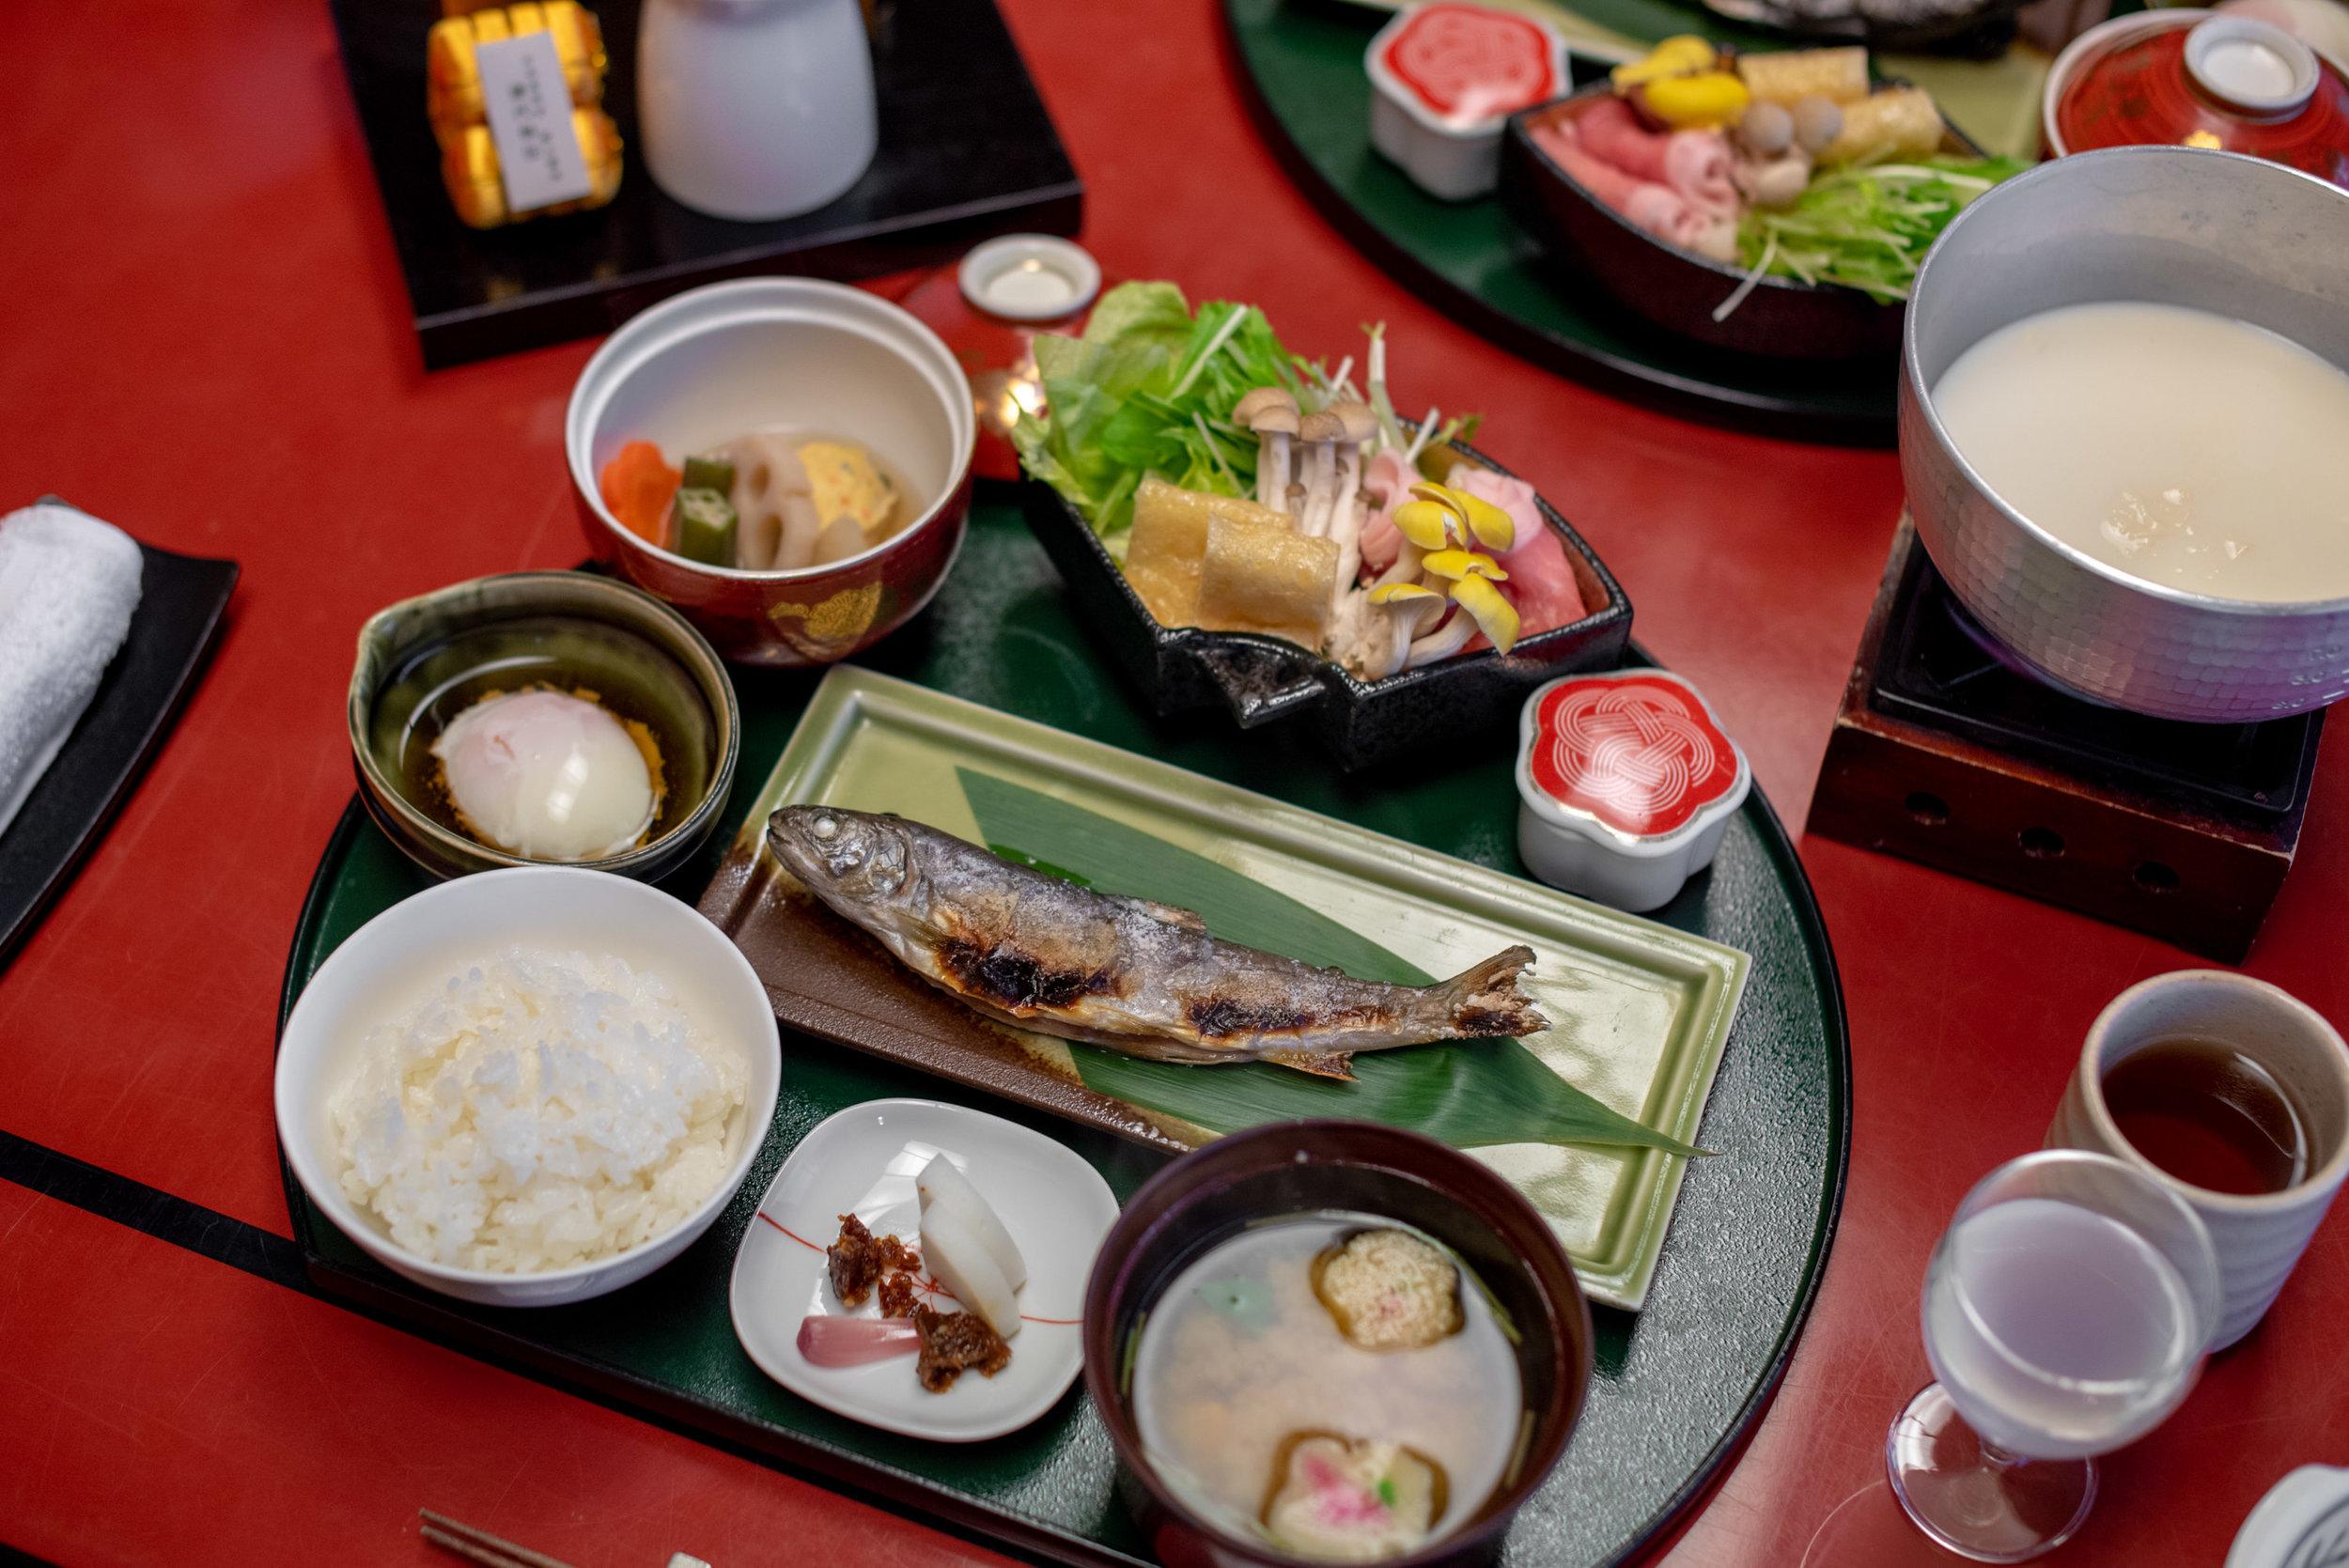 Yuba Hotpot and Seasonal Delicacies  Breakfast - Hoshino Resorts KAI Nikko